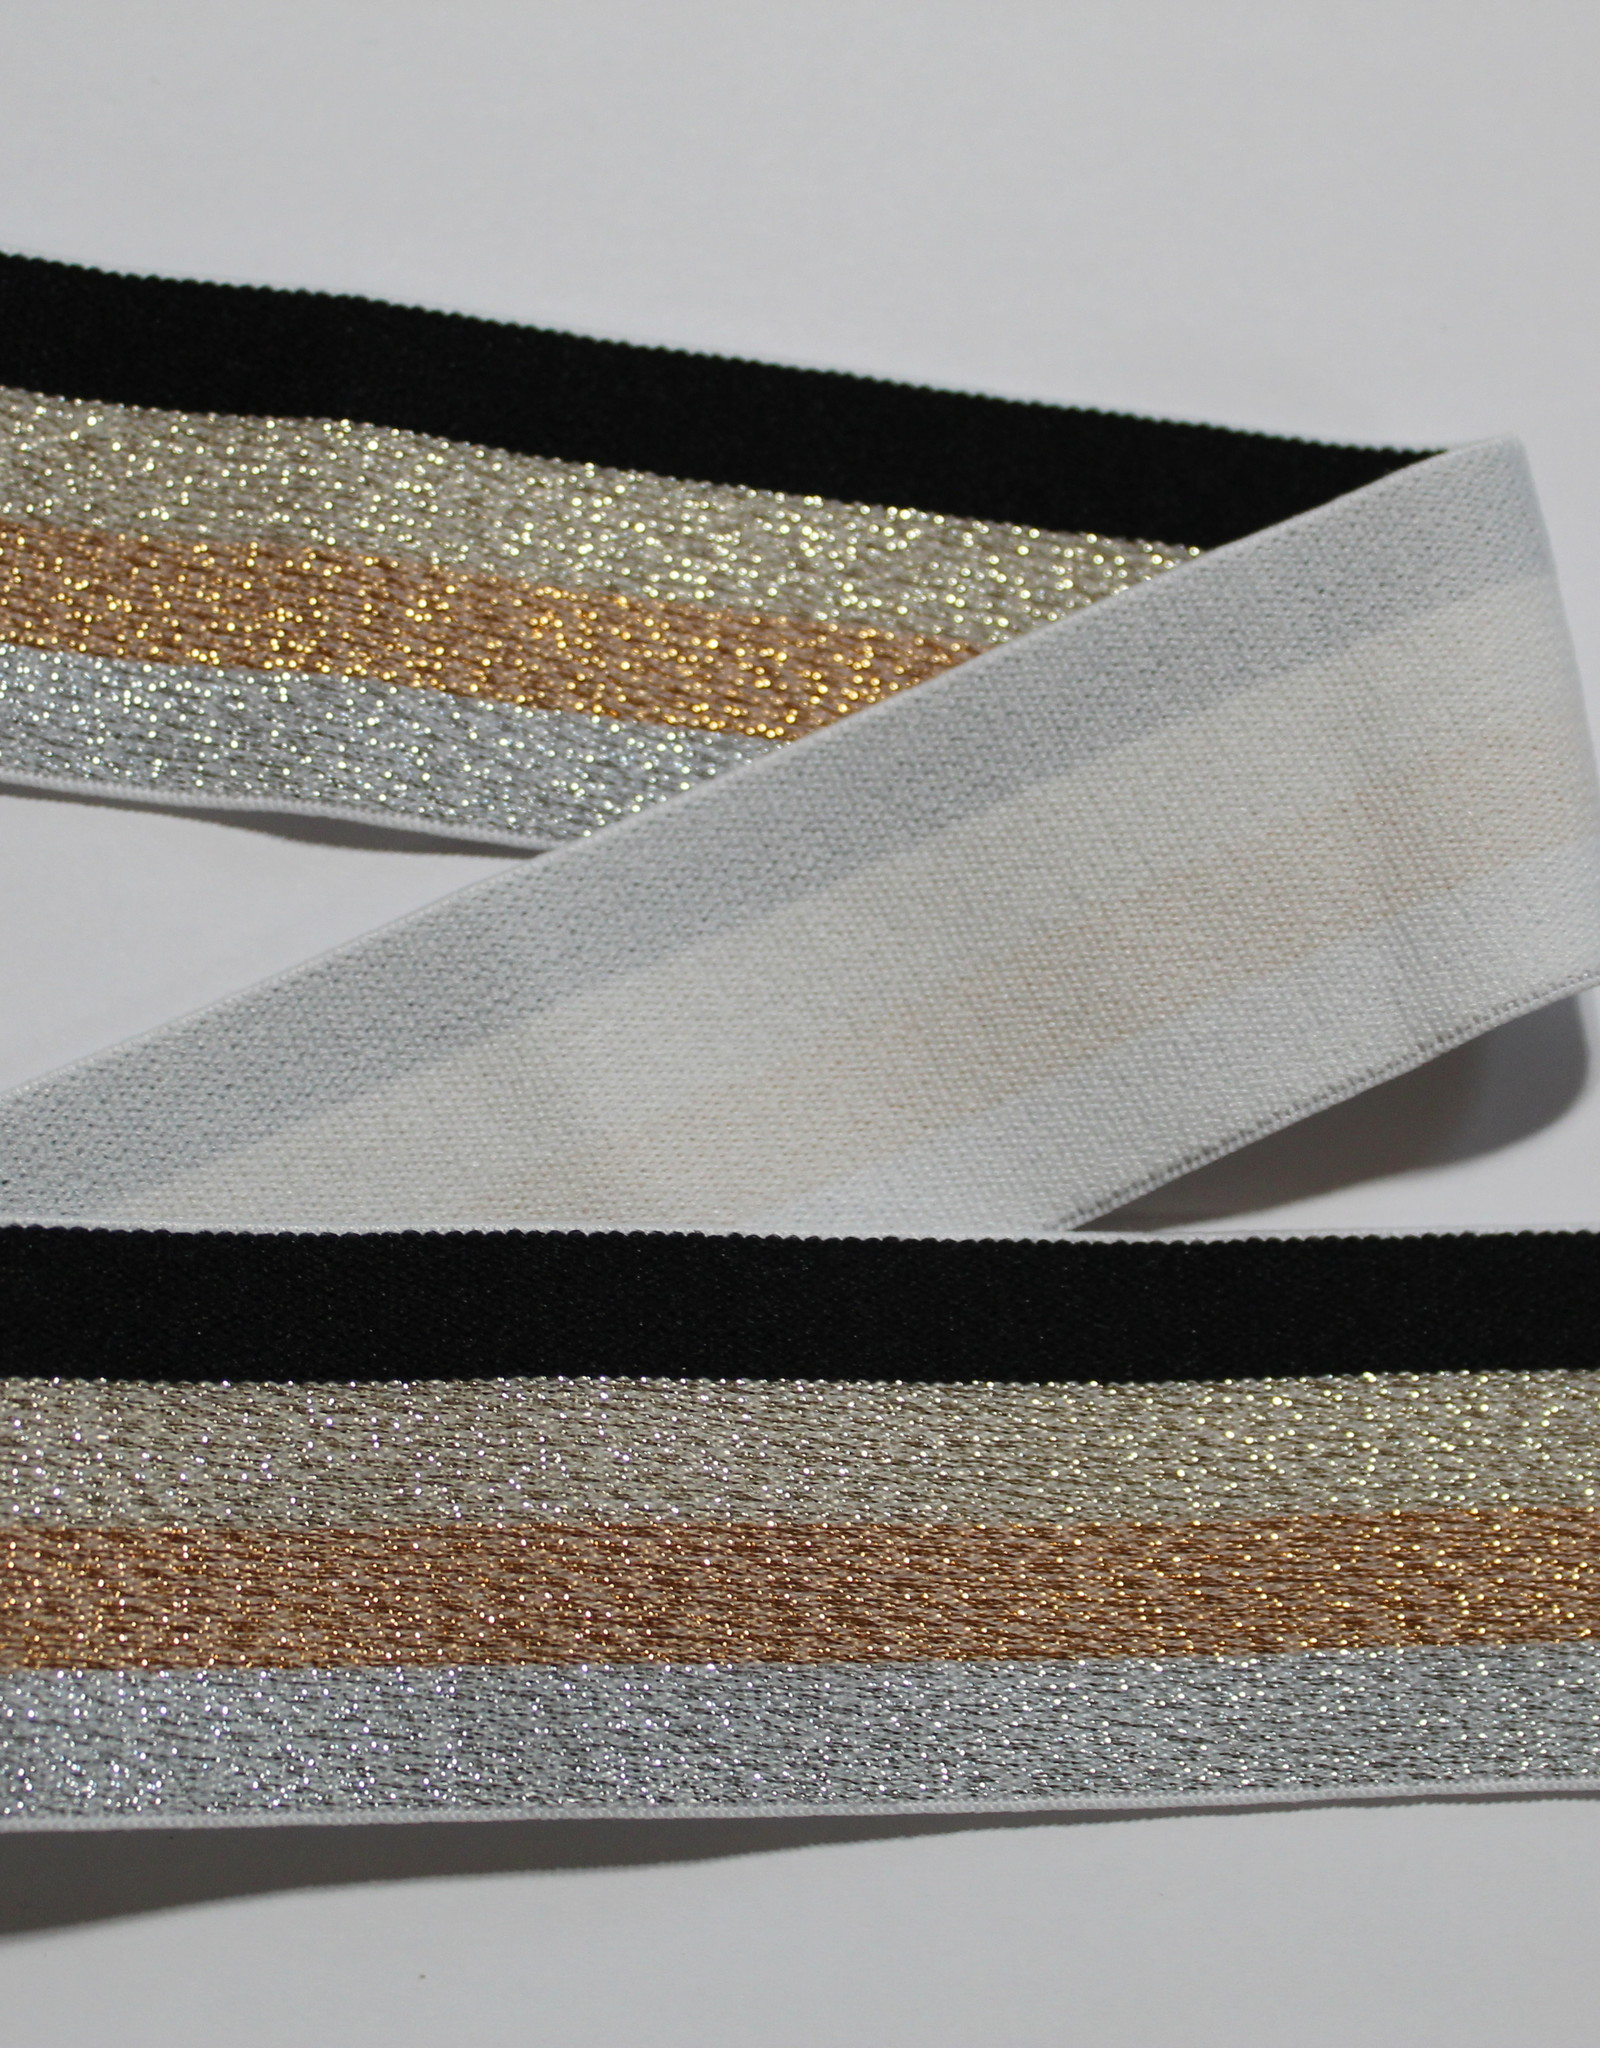 Union Knopf Elastiek zwart goud zilver gestreept glitters 40mm